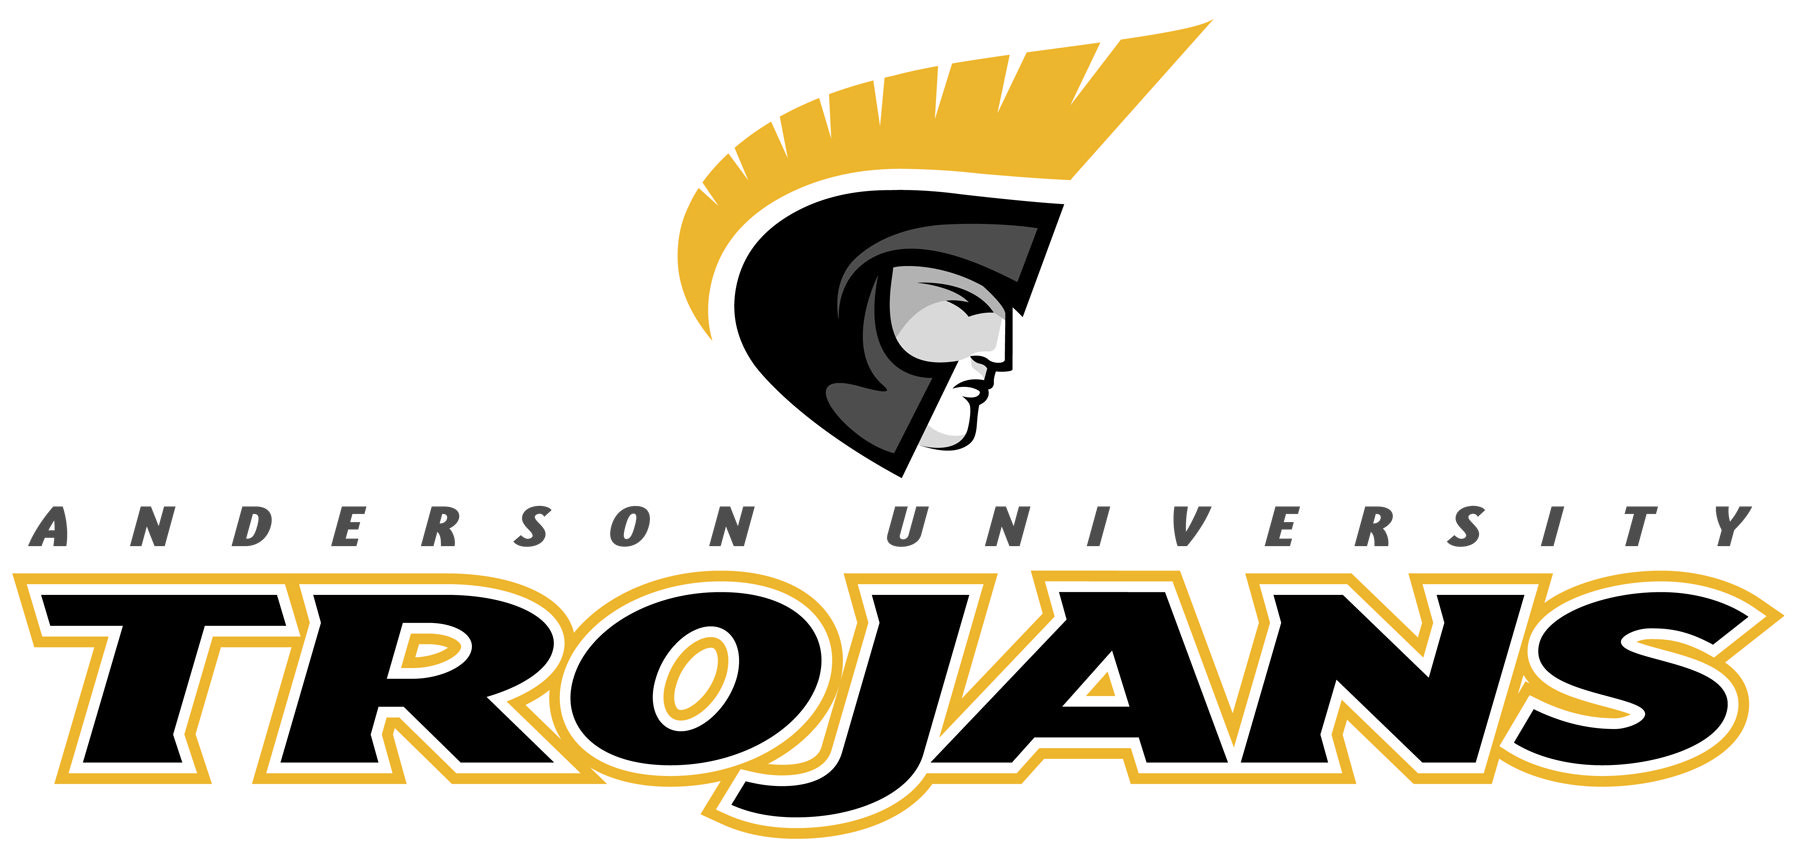 Anderson University Trojans Ncaa Division Ii South Atlantic